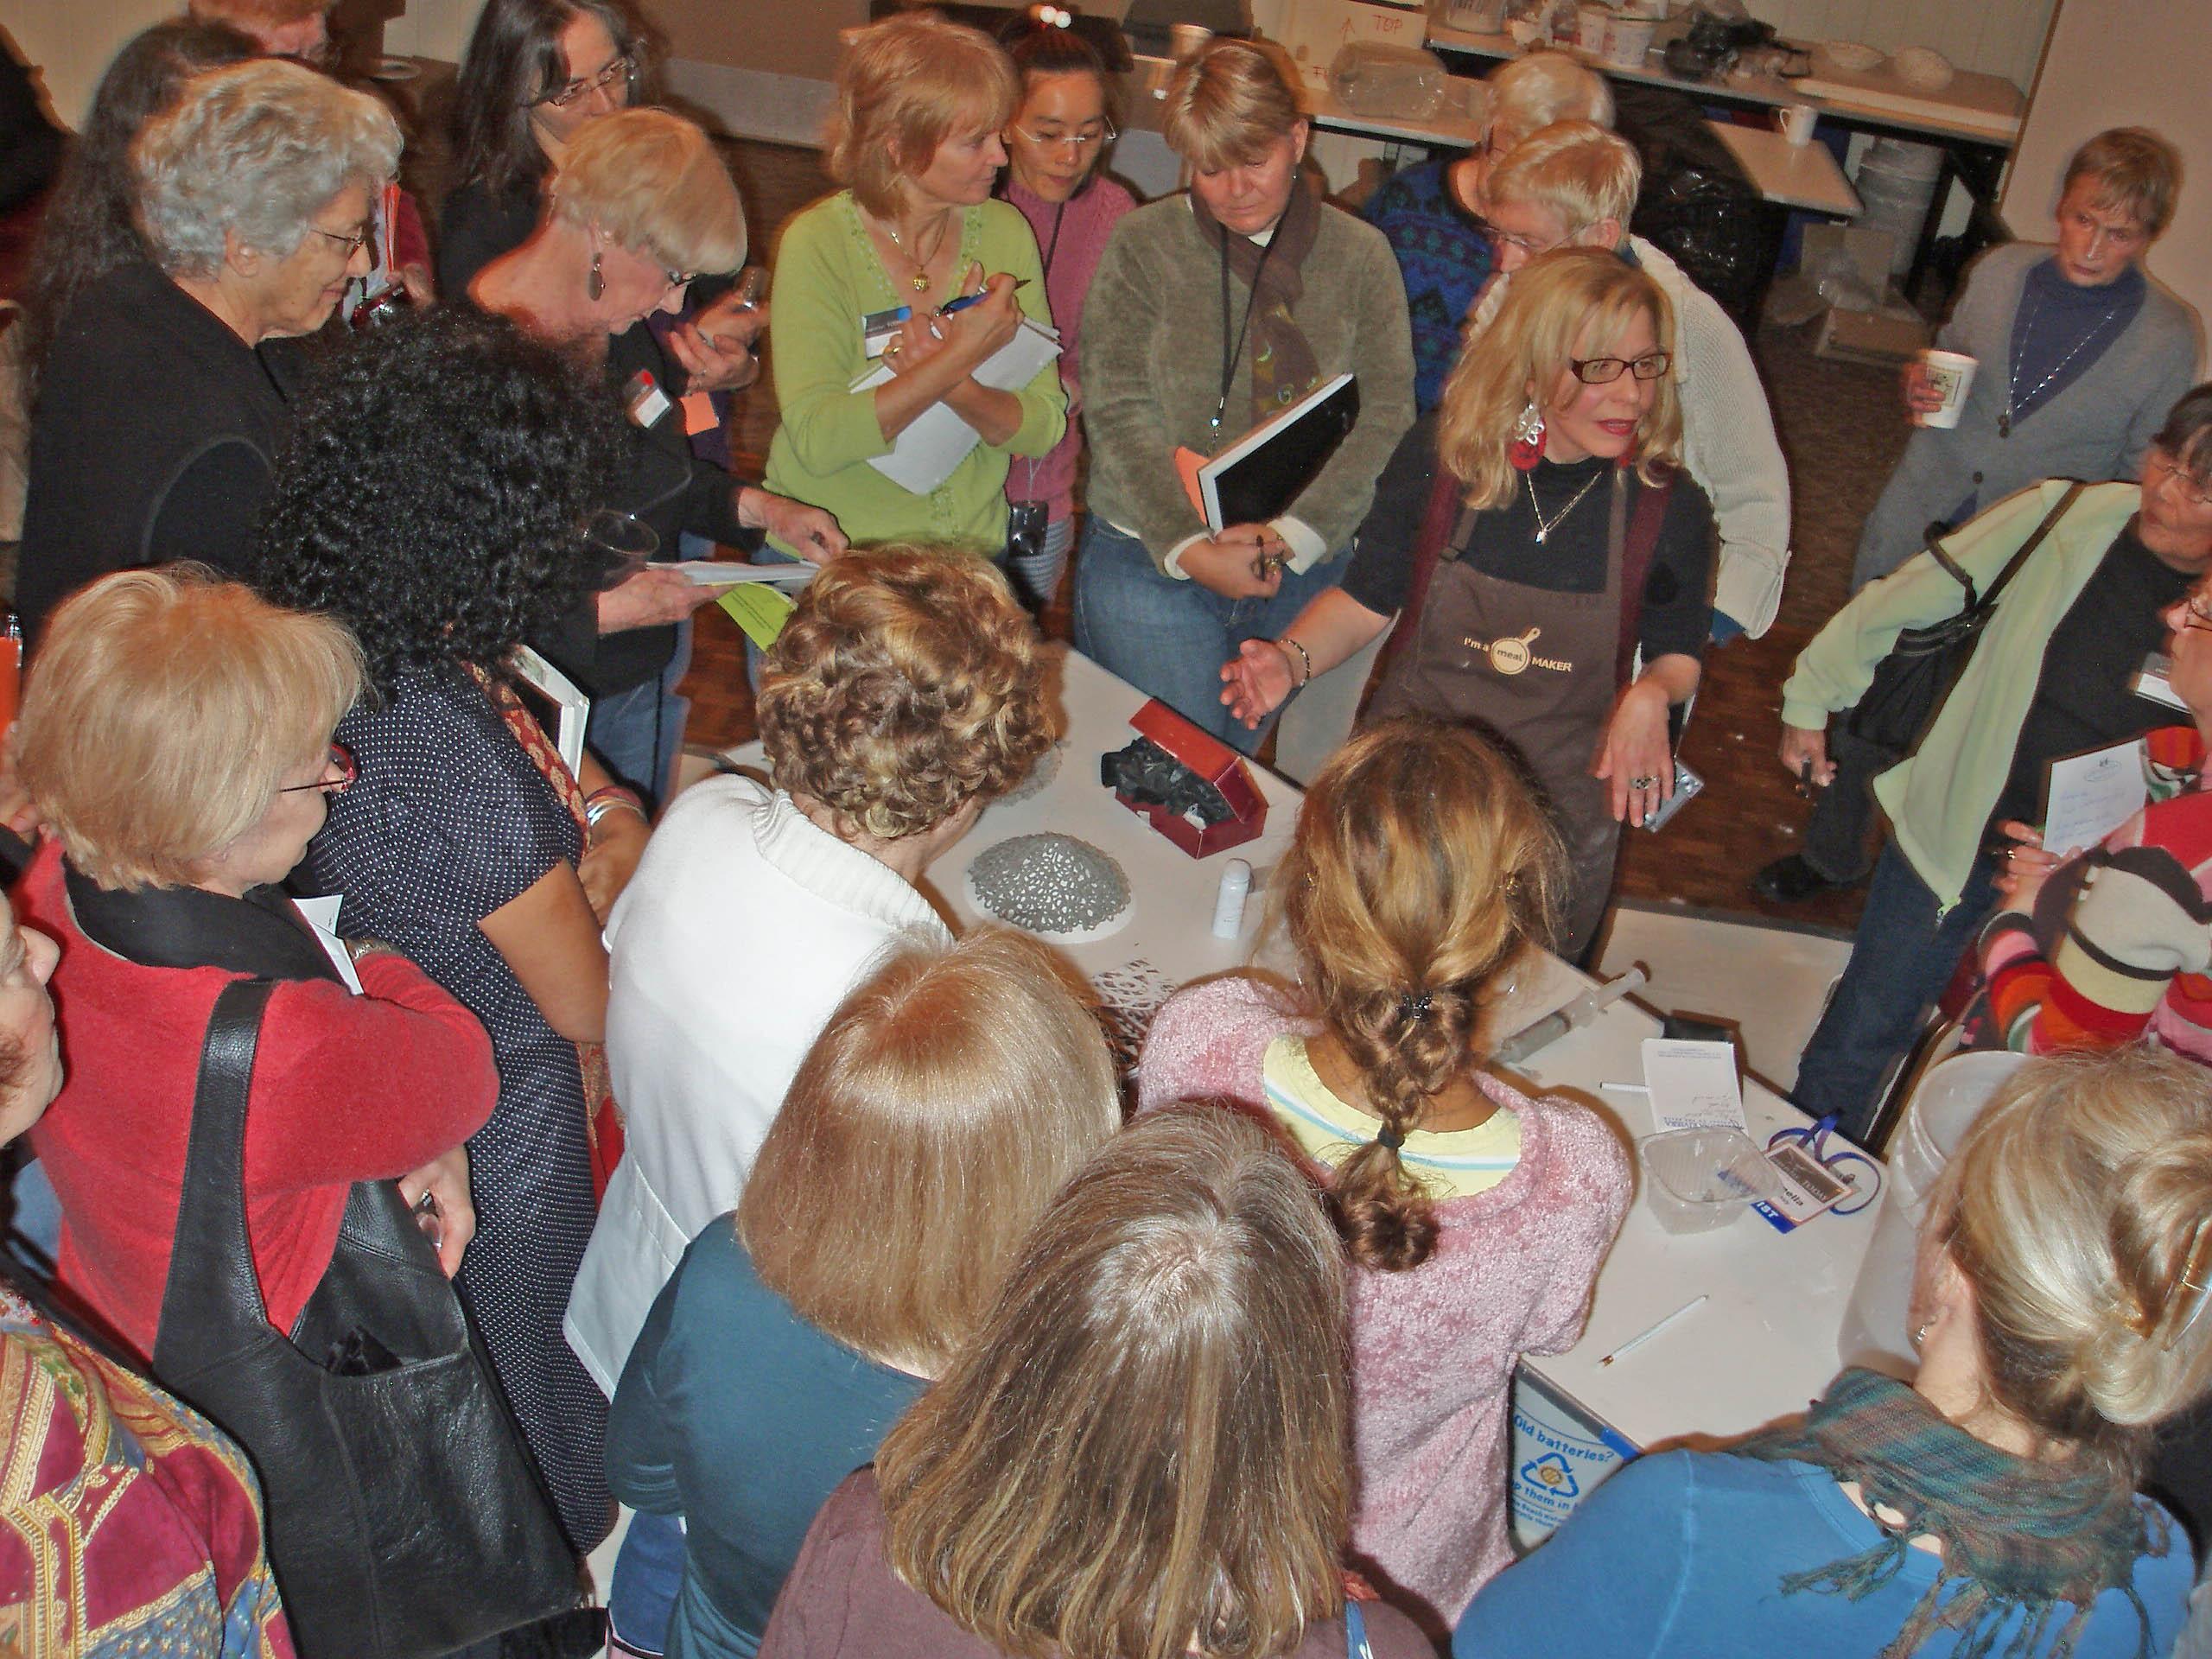 2012-11-02-AntonellaCimattiworkshopincaliforniapaperclayTODAYArtistSymposium.jpg